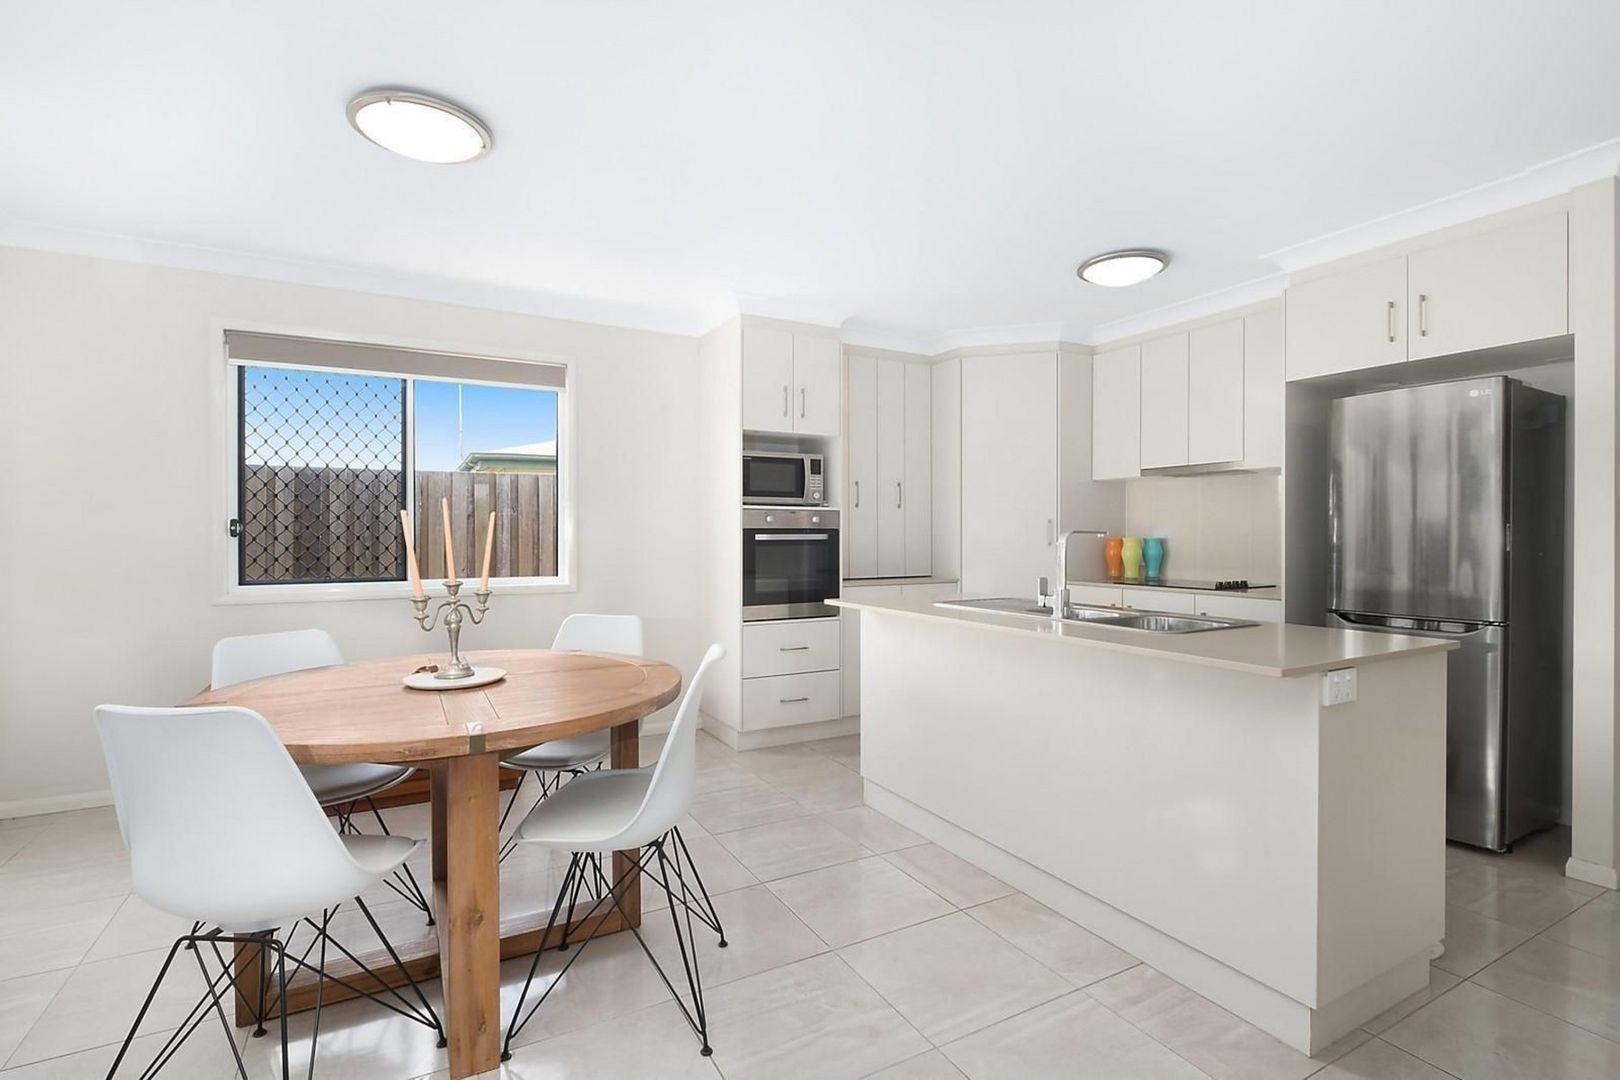 2/85 North Street, Harlaxton QLD 4350, Image 1